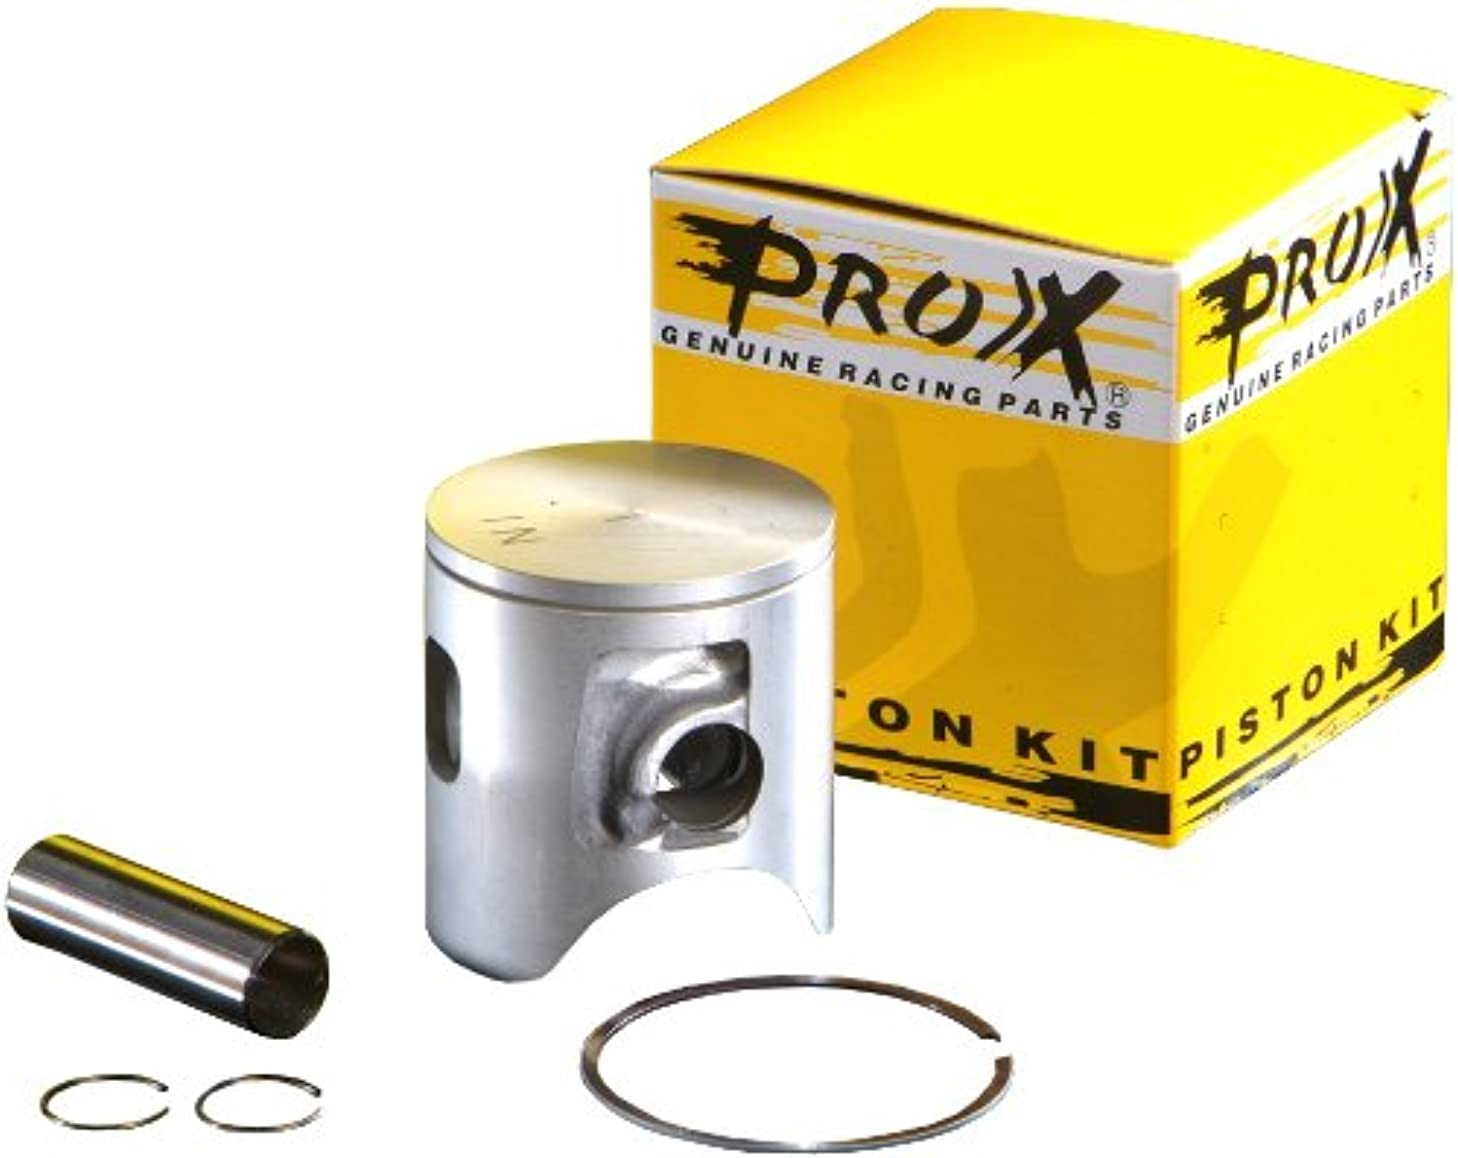 Prox Racing Parts 01.1320.A1 Piston Kit